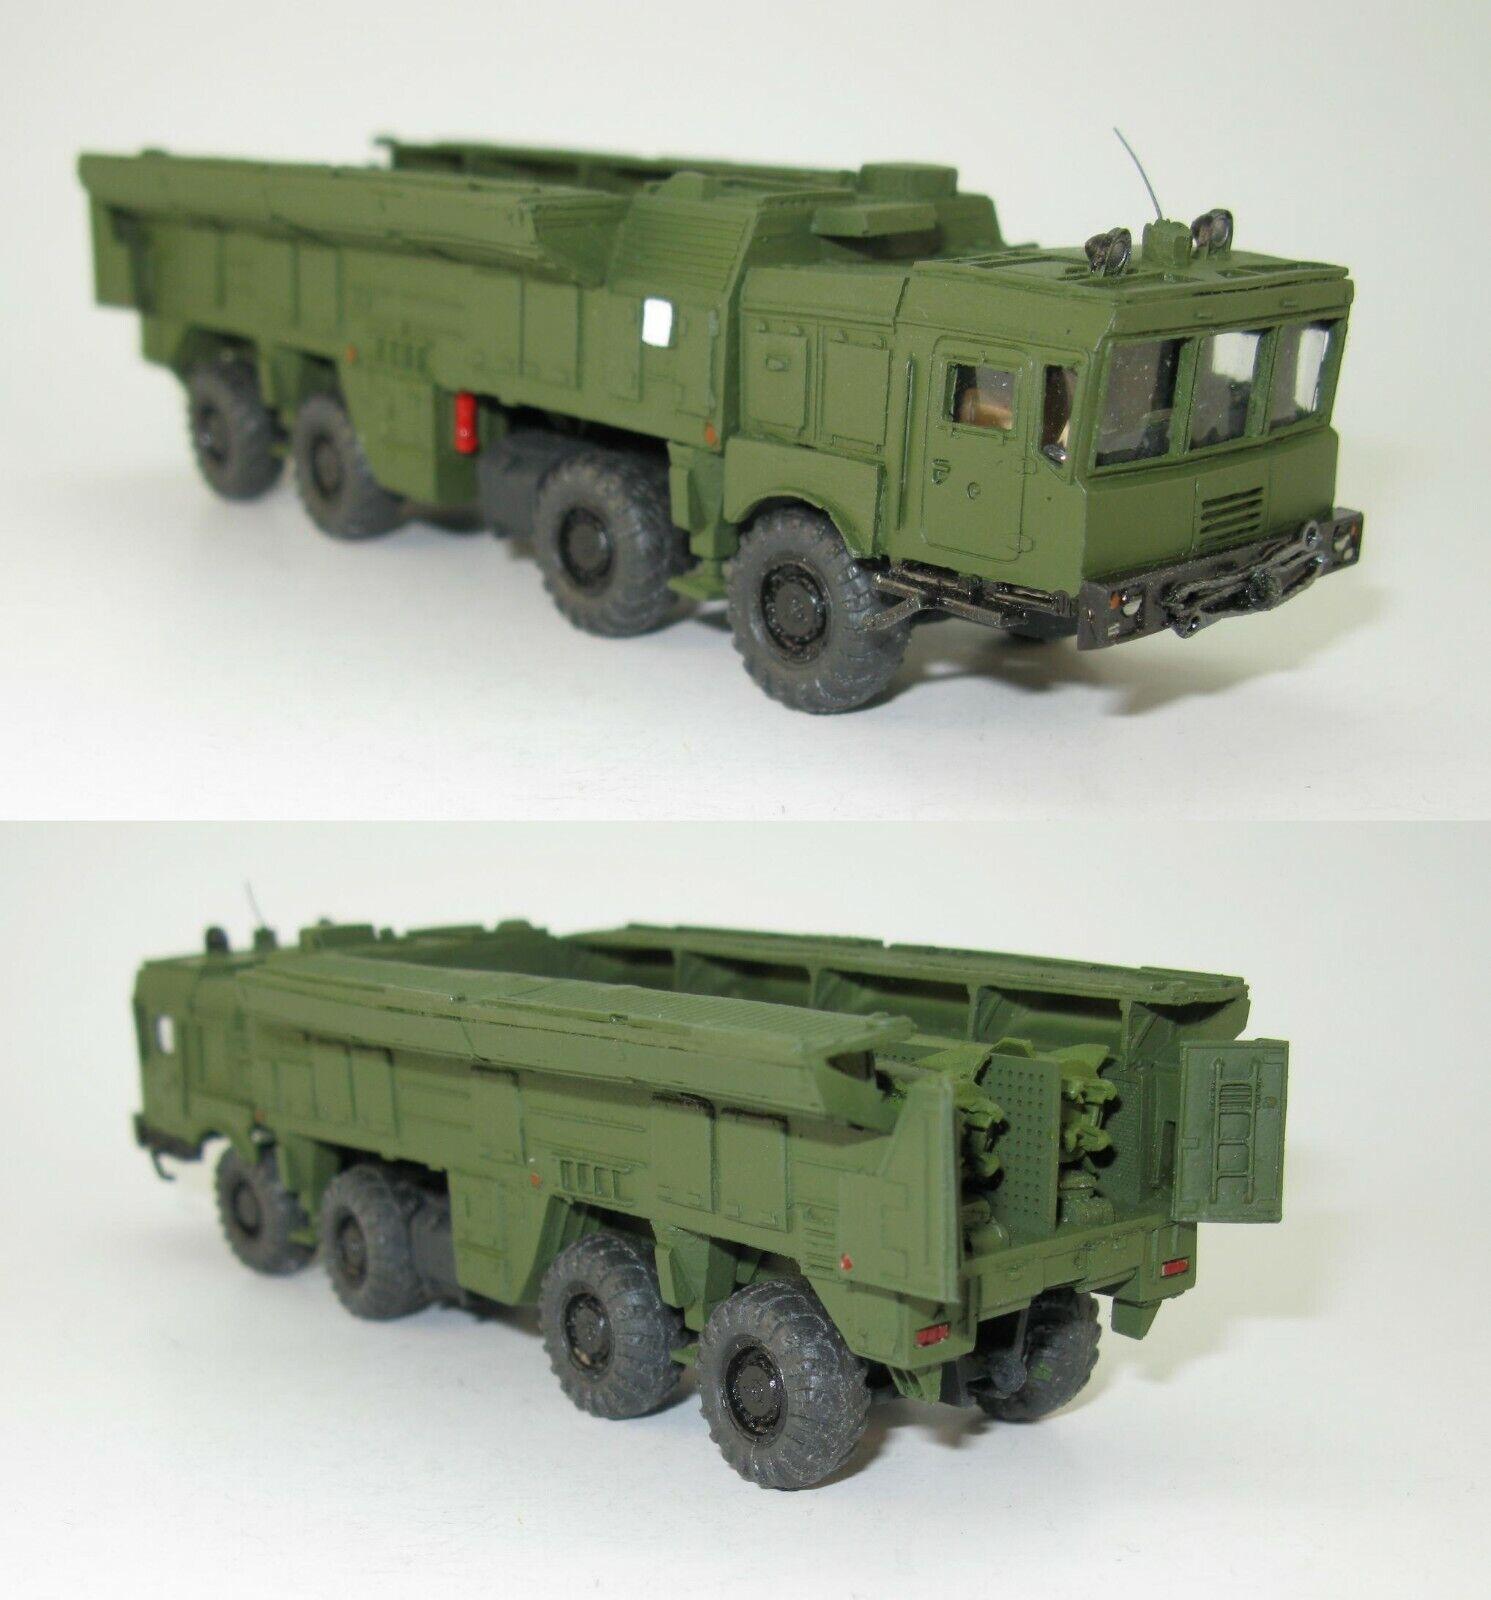 9K720 Iskander mobile ballistische Kurzstreckenrakete SS-26 Stone - 1 87 HO